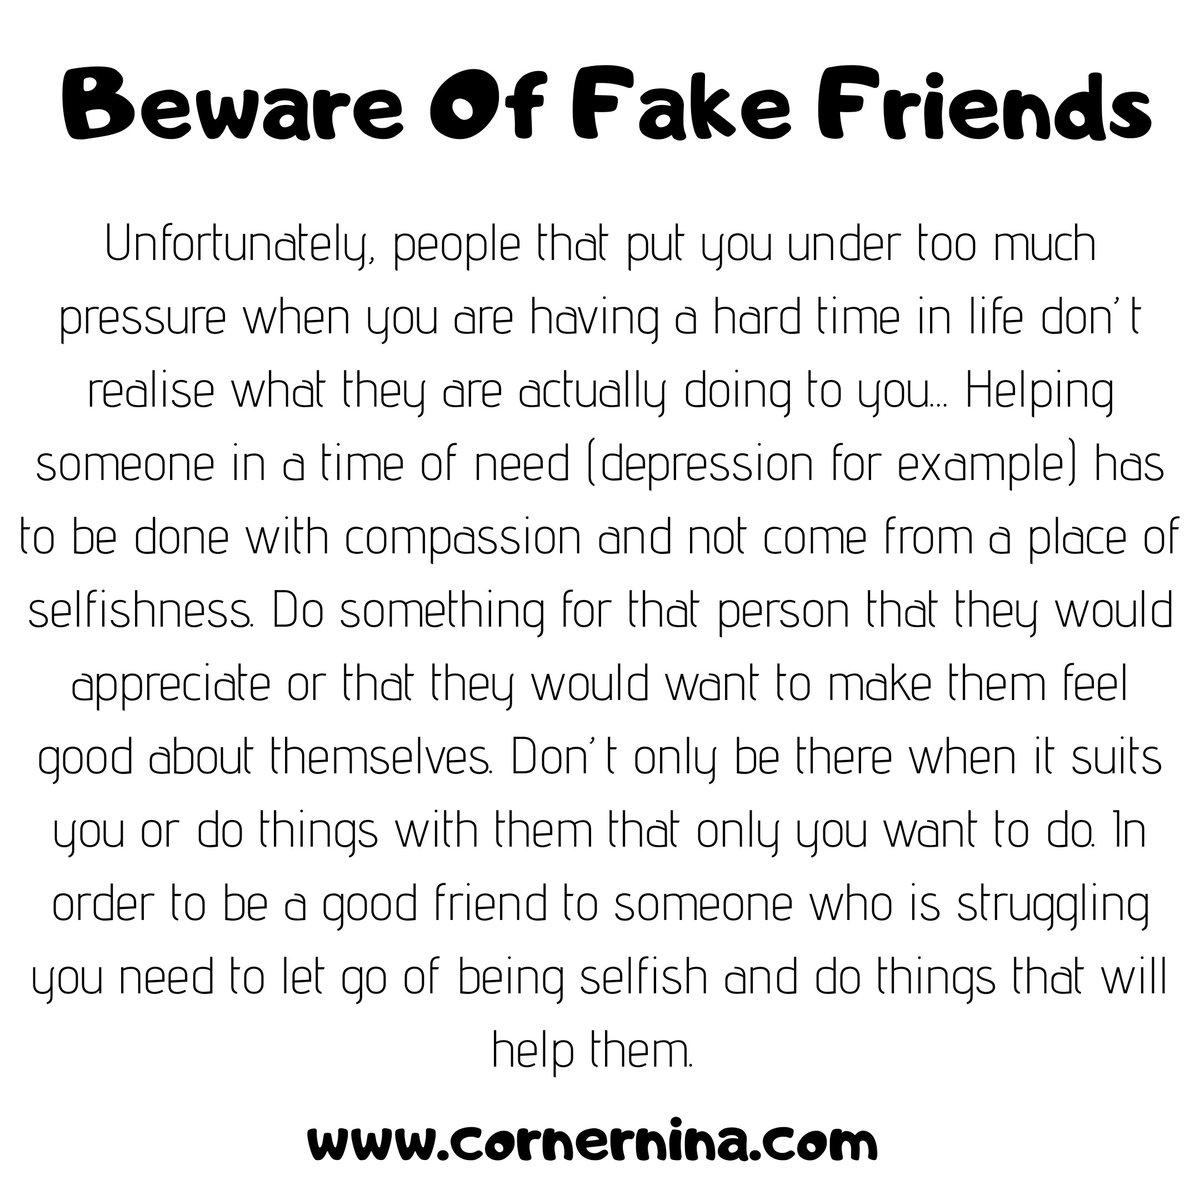 #fakefriends #fakepeople #mentalhealth #mentalhealthawareness #mentalhealthmatters #anxietyhelp #anxietyquote #anxious #anxietydisorders #anxietyproblems #anxietyattack #panic #mentalhealth #depression #depressionawareness